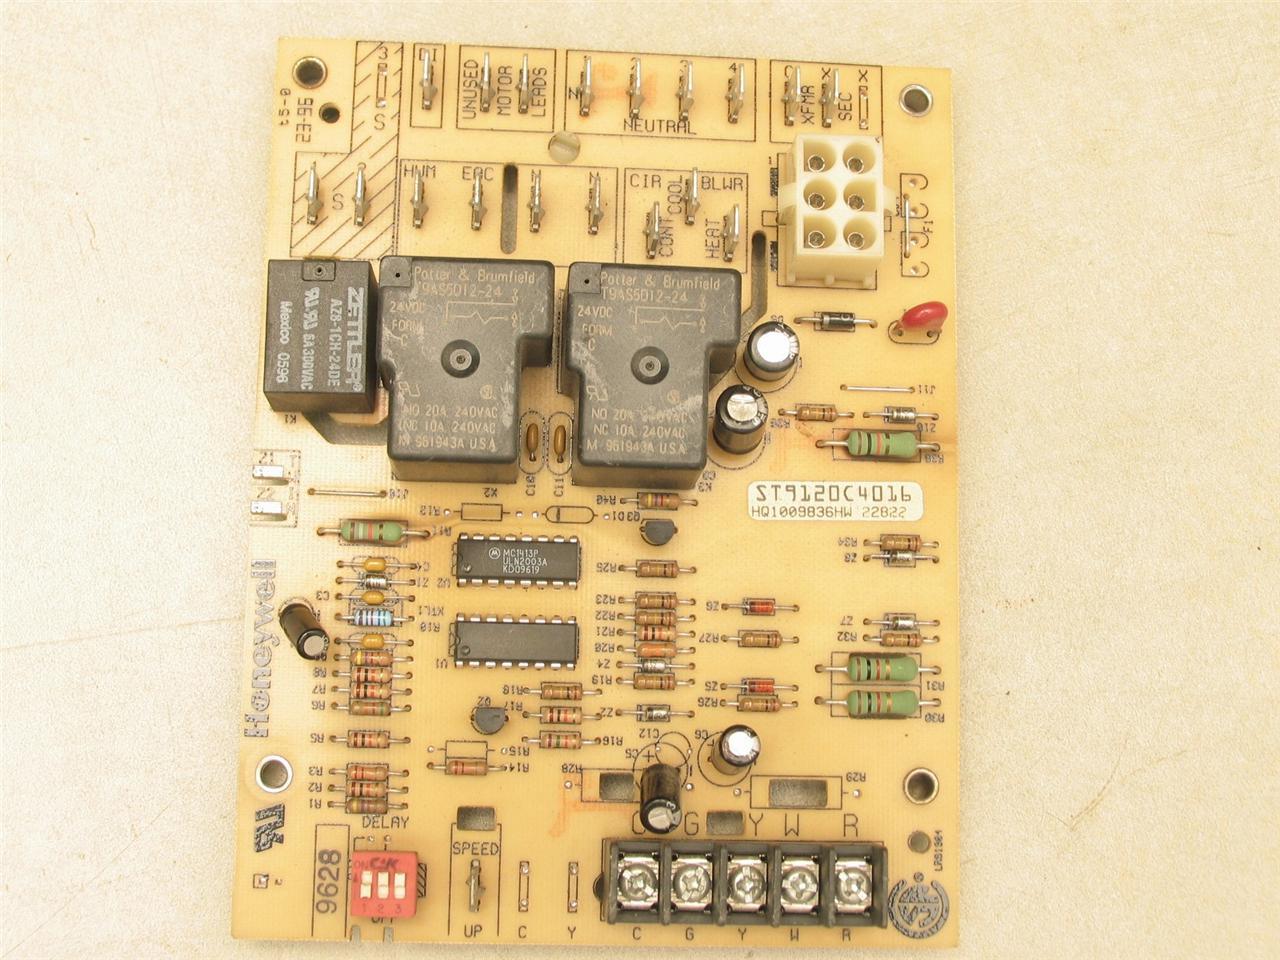 honeywell st9120c4016 furnace control circuit board